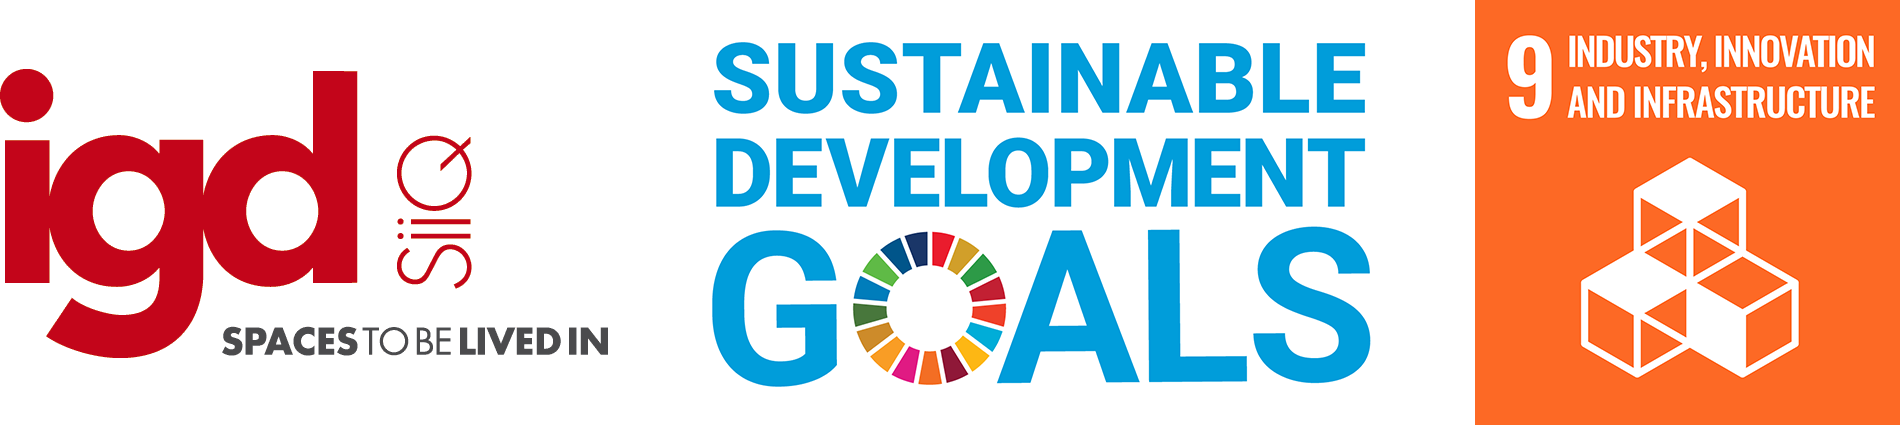 SDG_IGD_eng_09